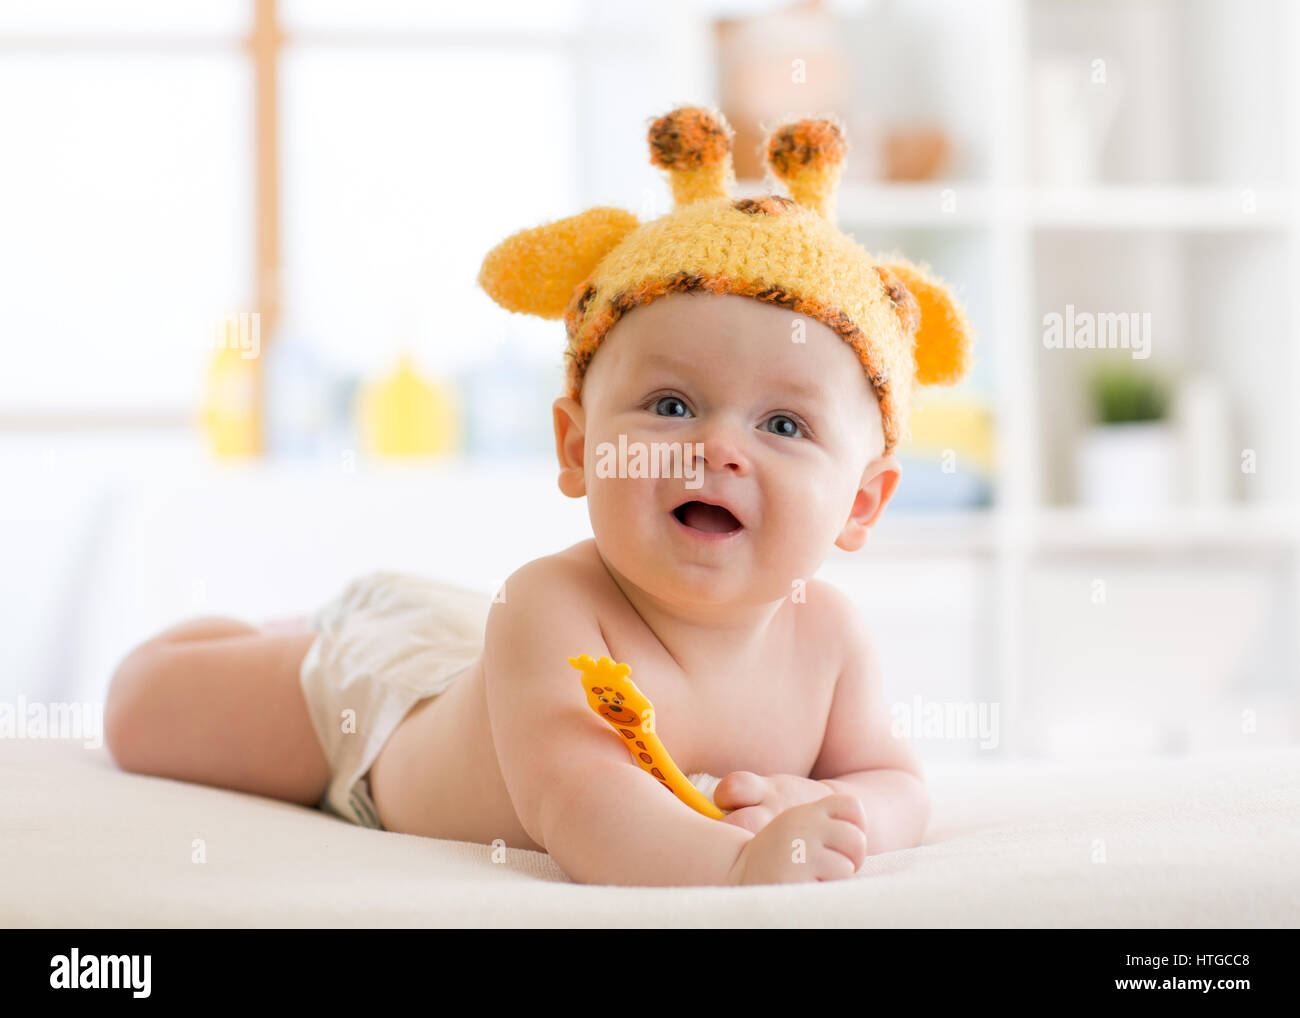 happy infant baby child in giraffe costume  sc 1 st  Alamy & happy infant baby child in giraffe costume Stock Photo: 135585304 ...